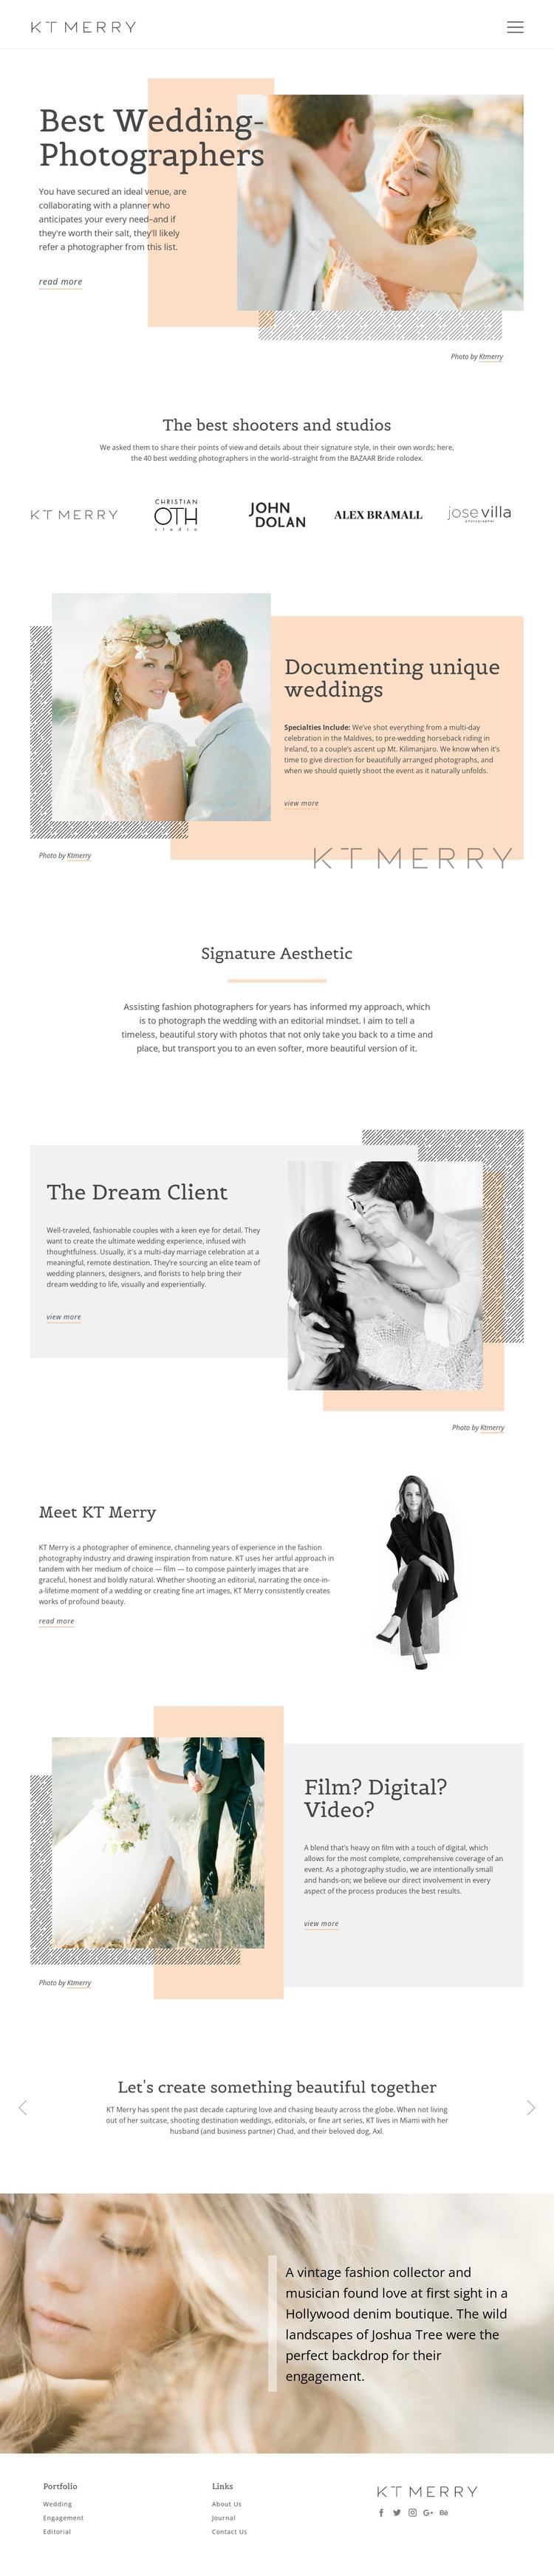 Wedding Photographers Website Builder Software